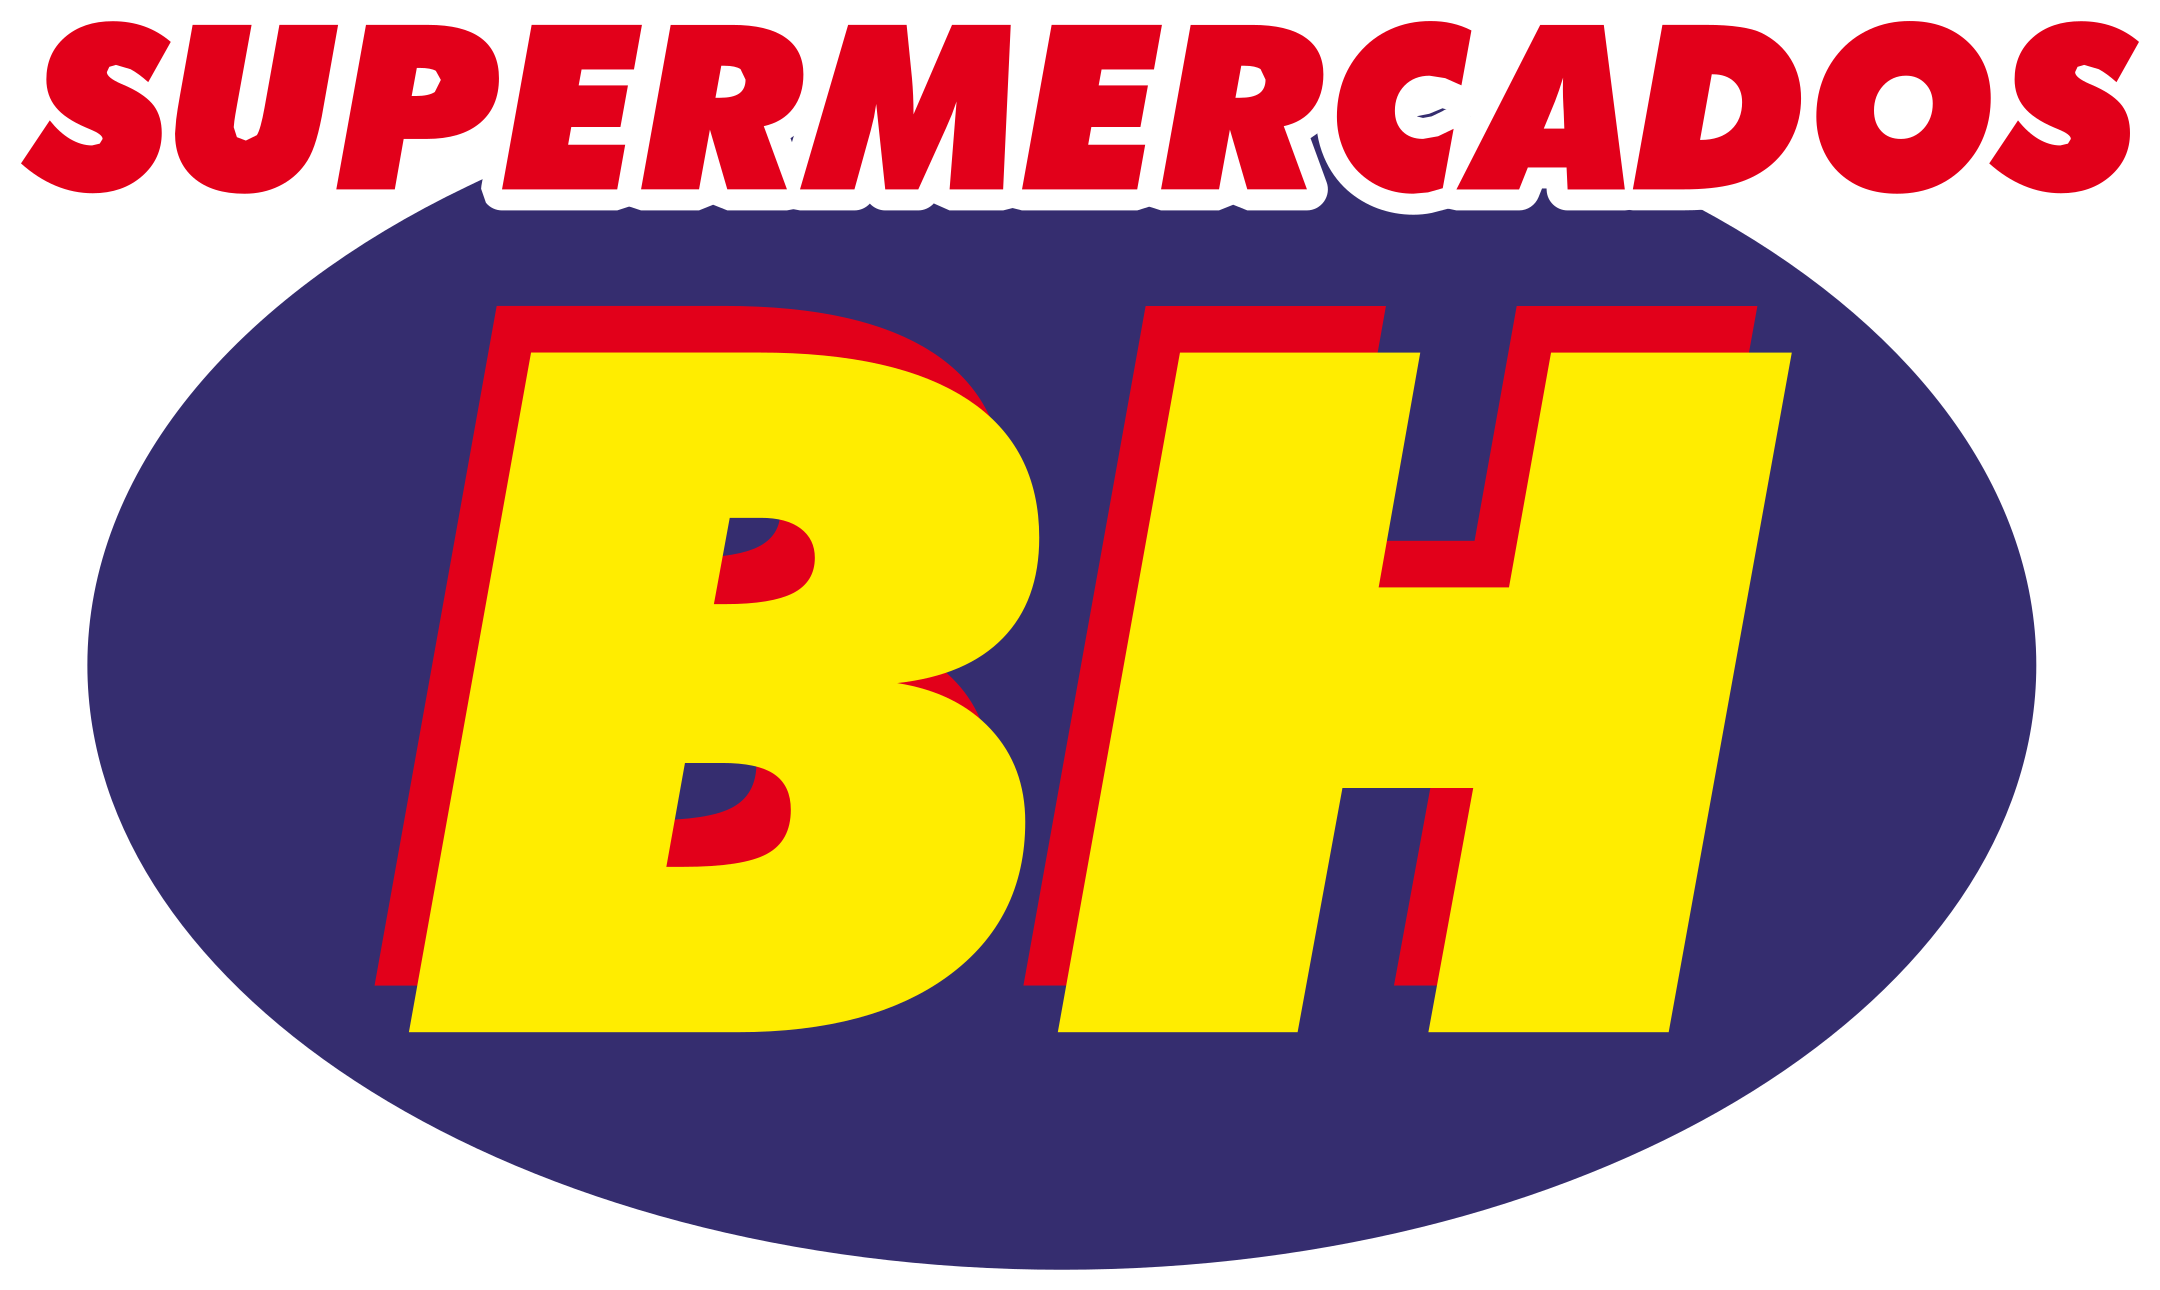 supermercados bh logo 1 - Supermercados BH Logo